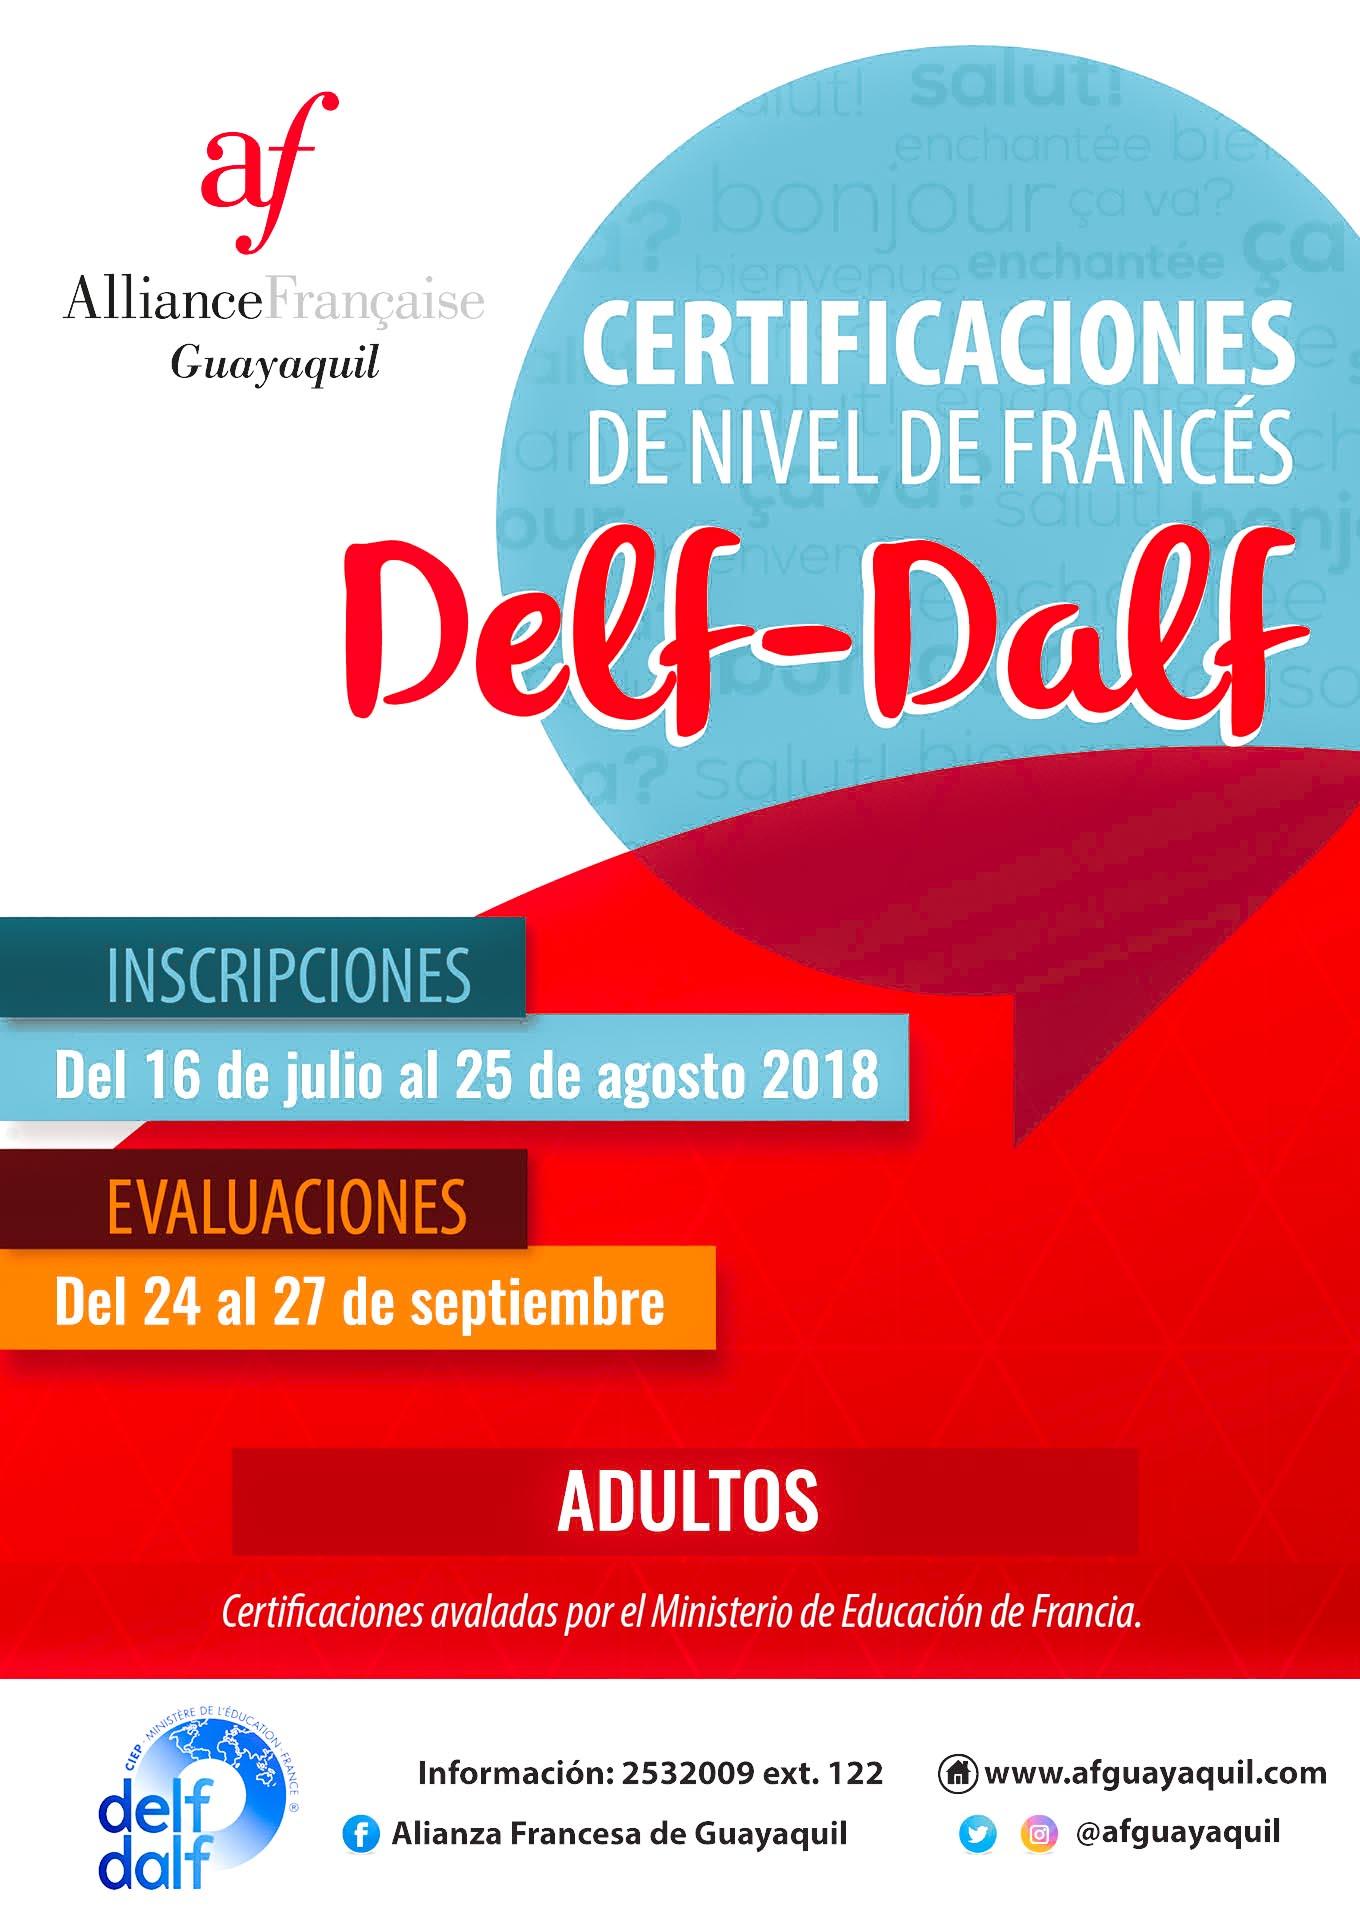 Inscripciones Exámenes Delf Dalf